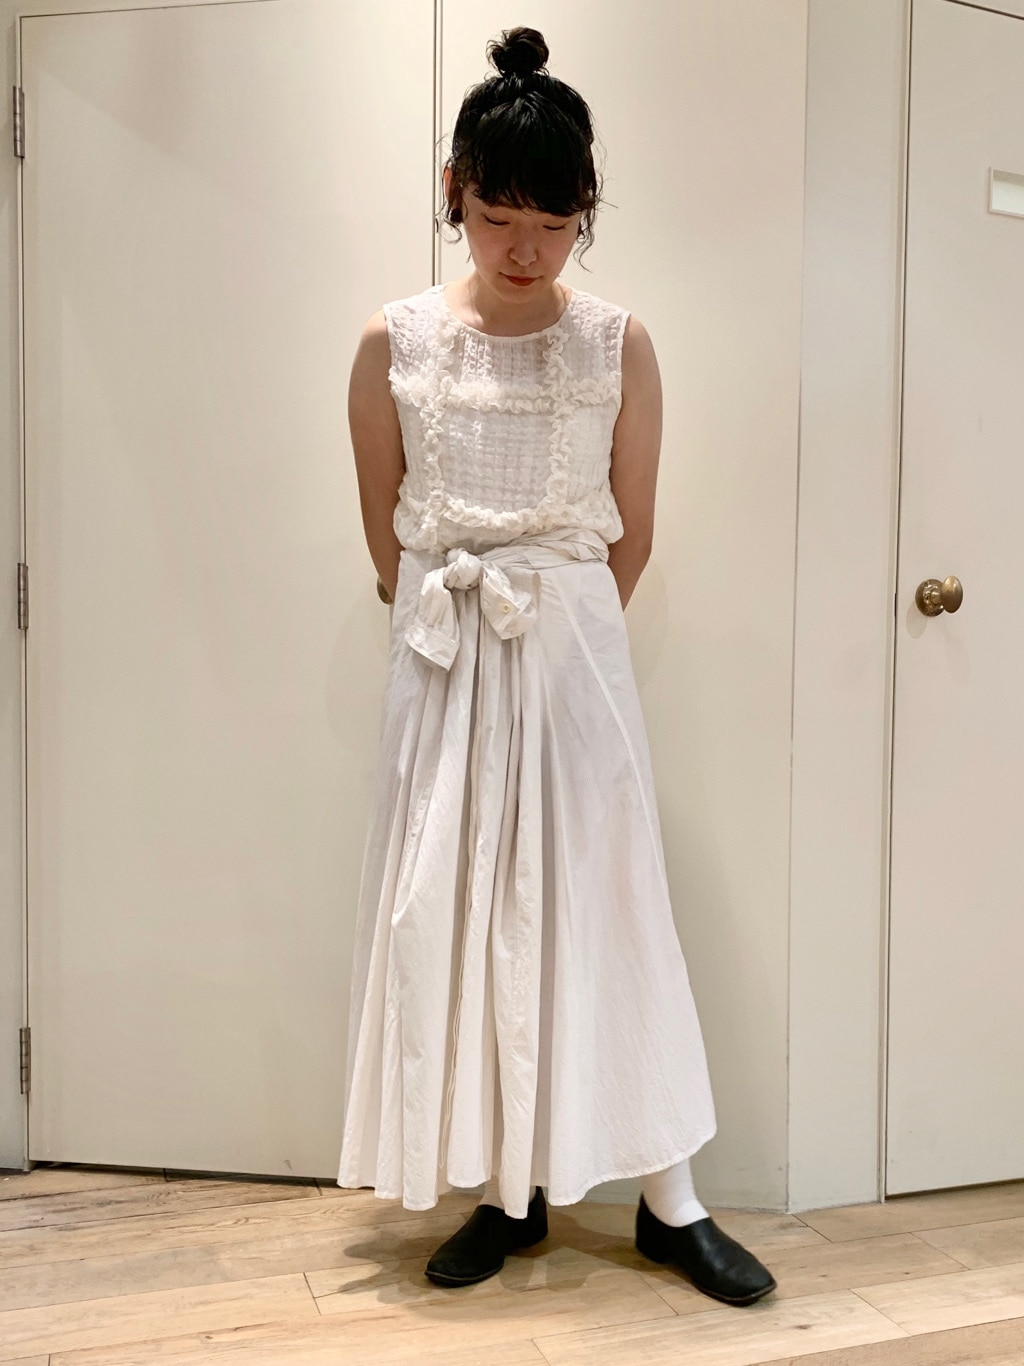 bulle de savon 新宿ミロード 身長:159cm 2020.07.29